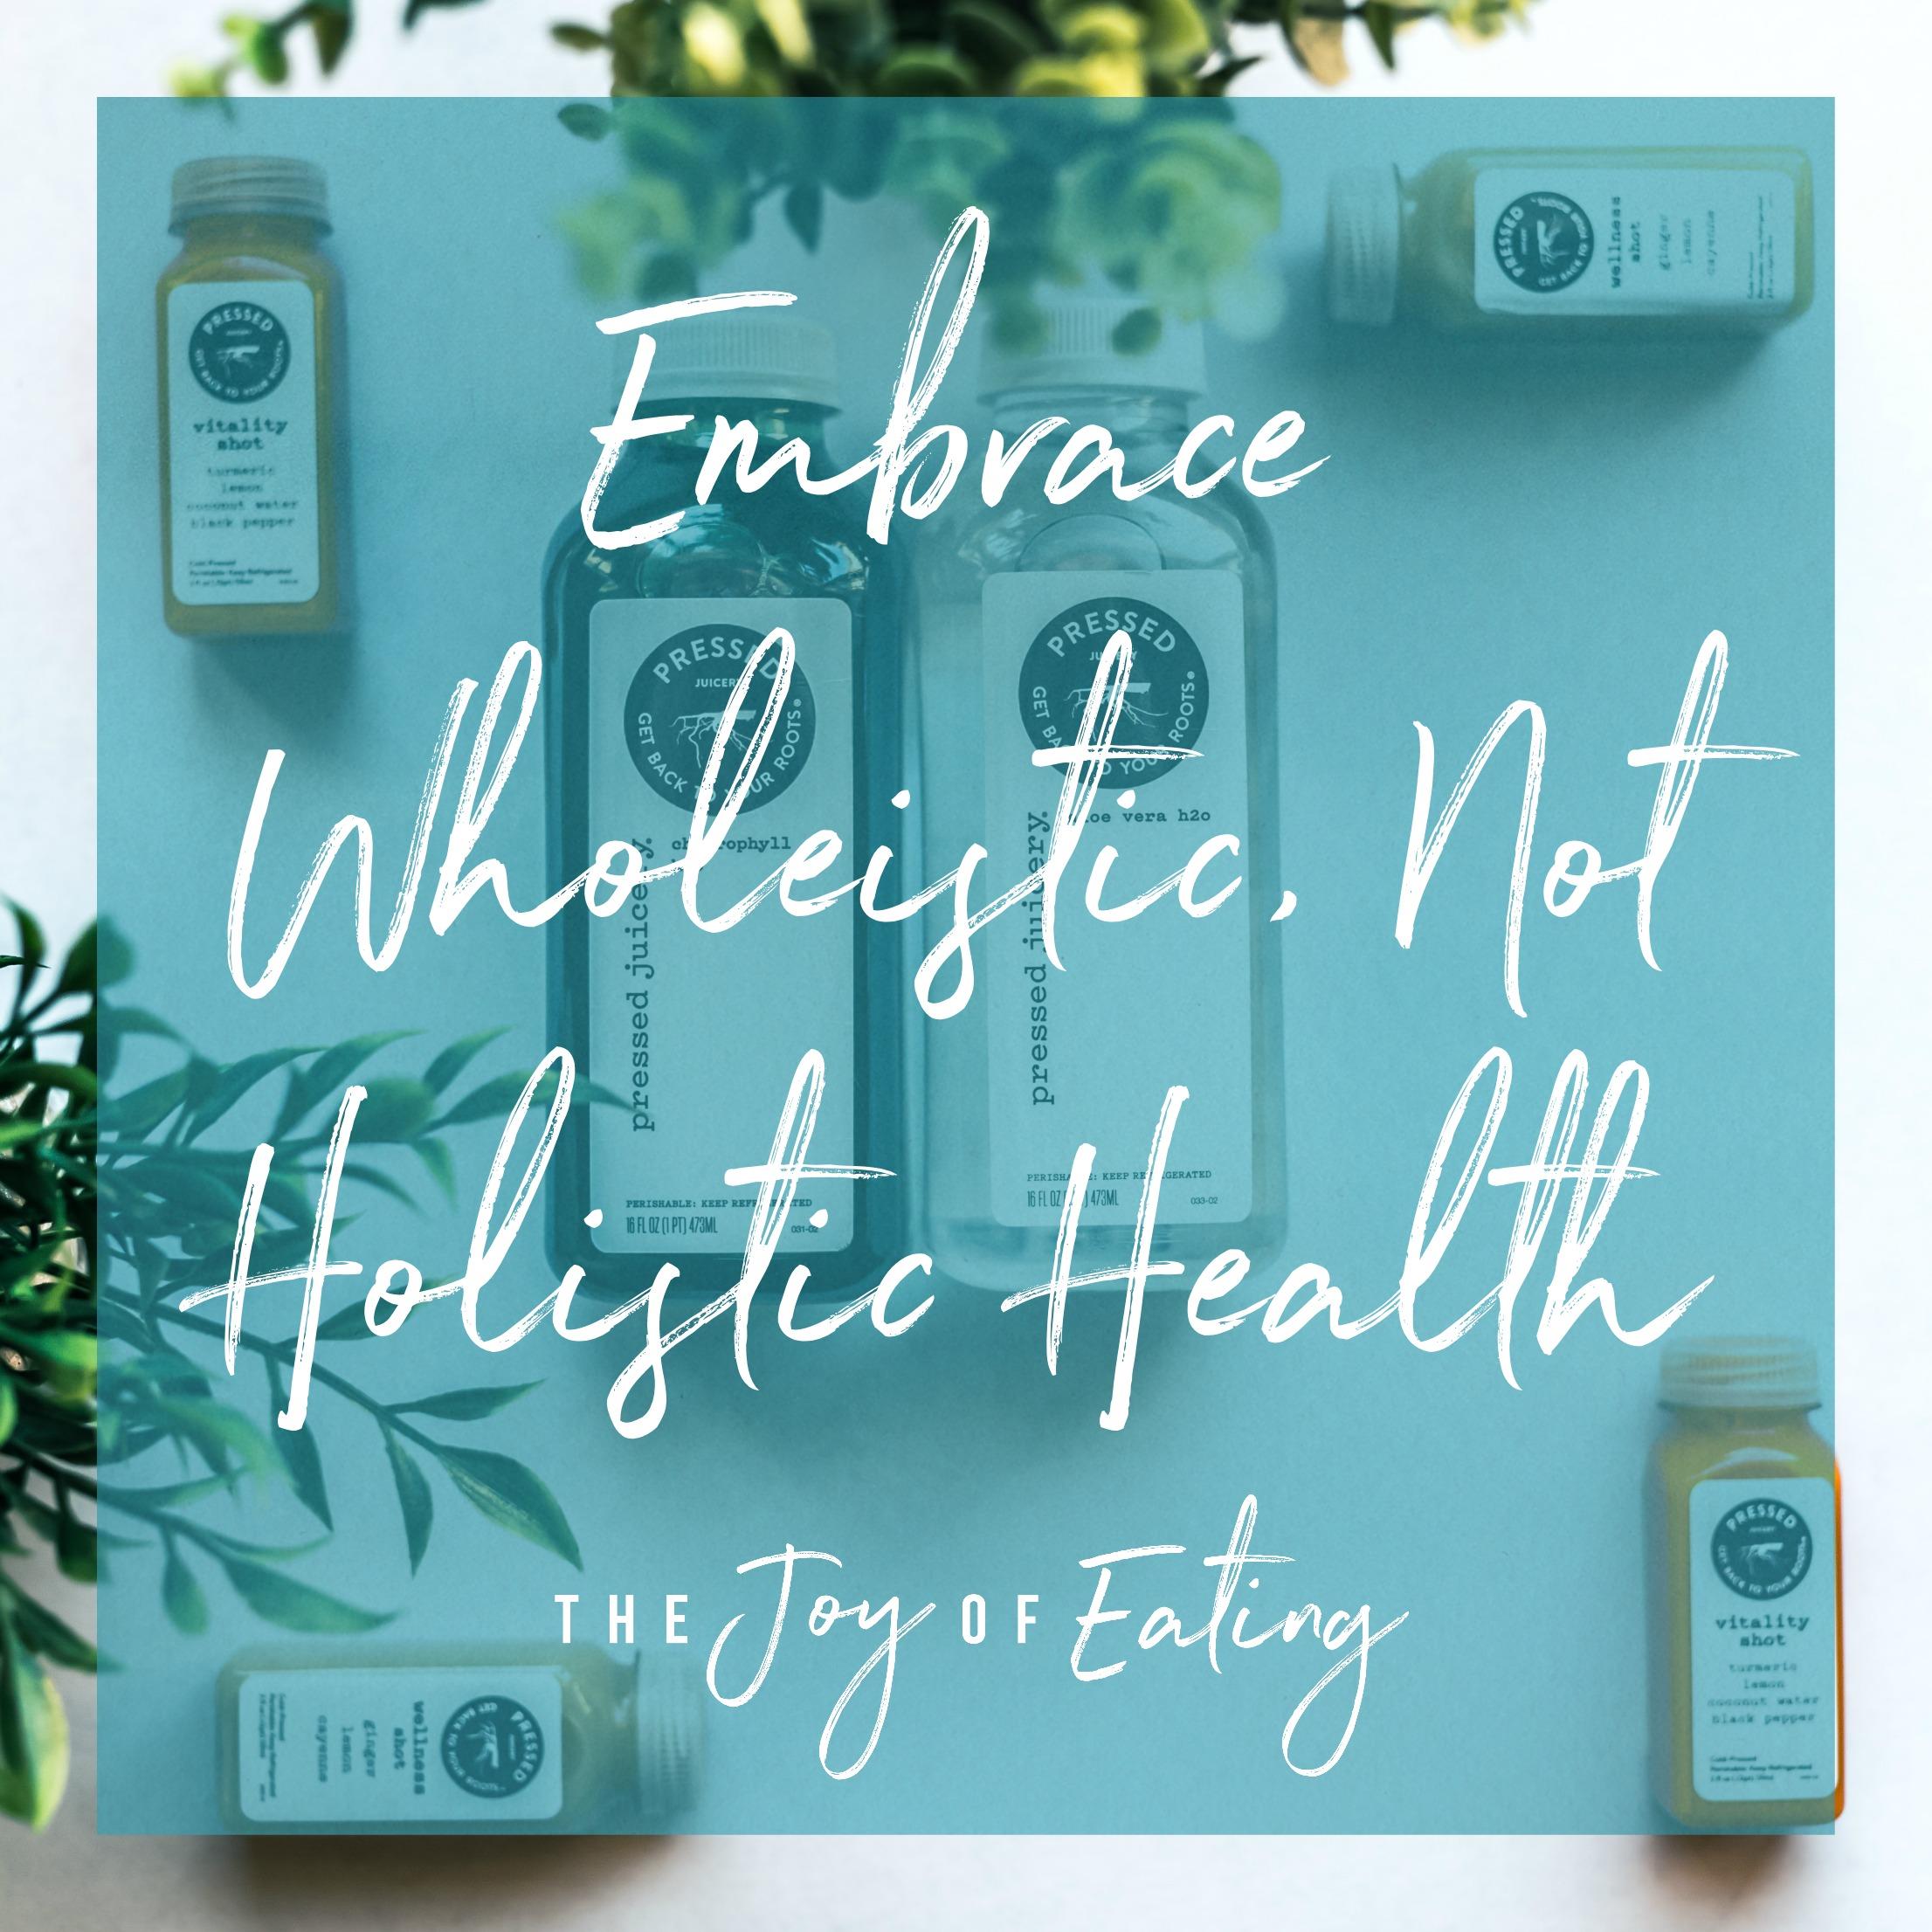 Embrace wholeistic, not holistic health. #health #dietitian #wellness #nutrition #holistichealth